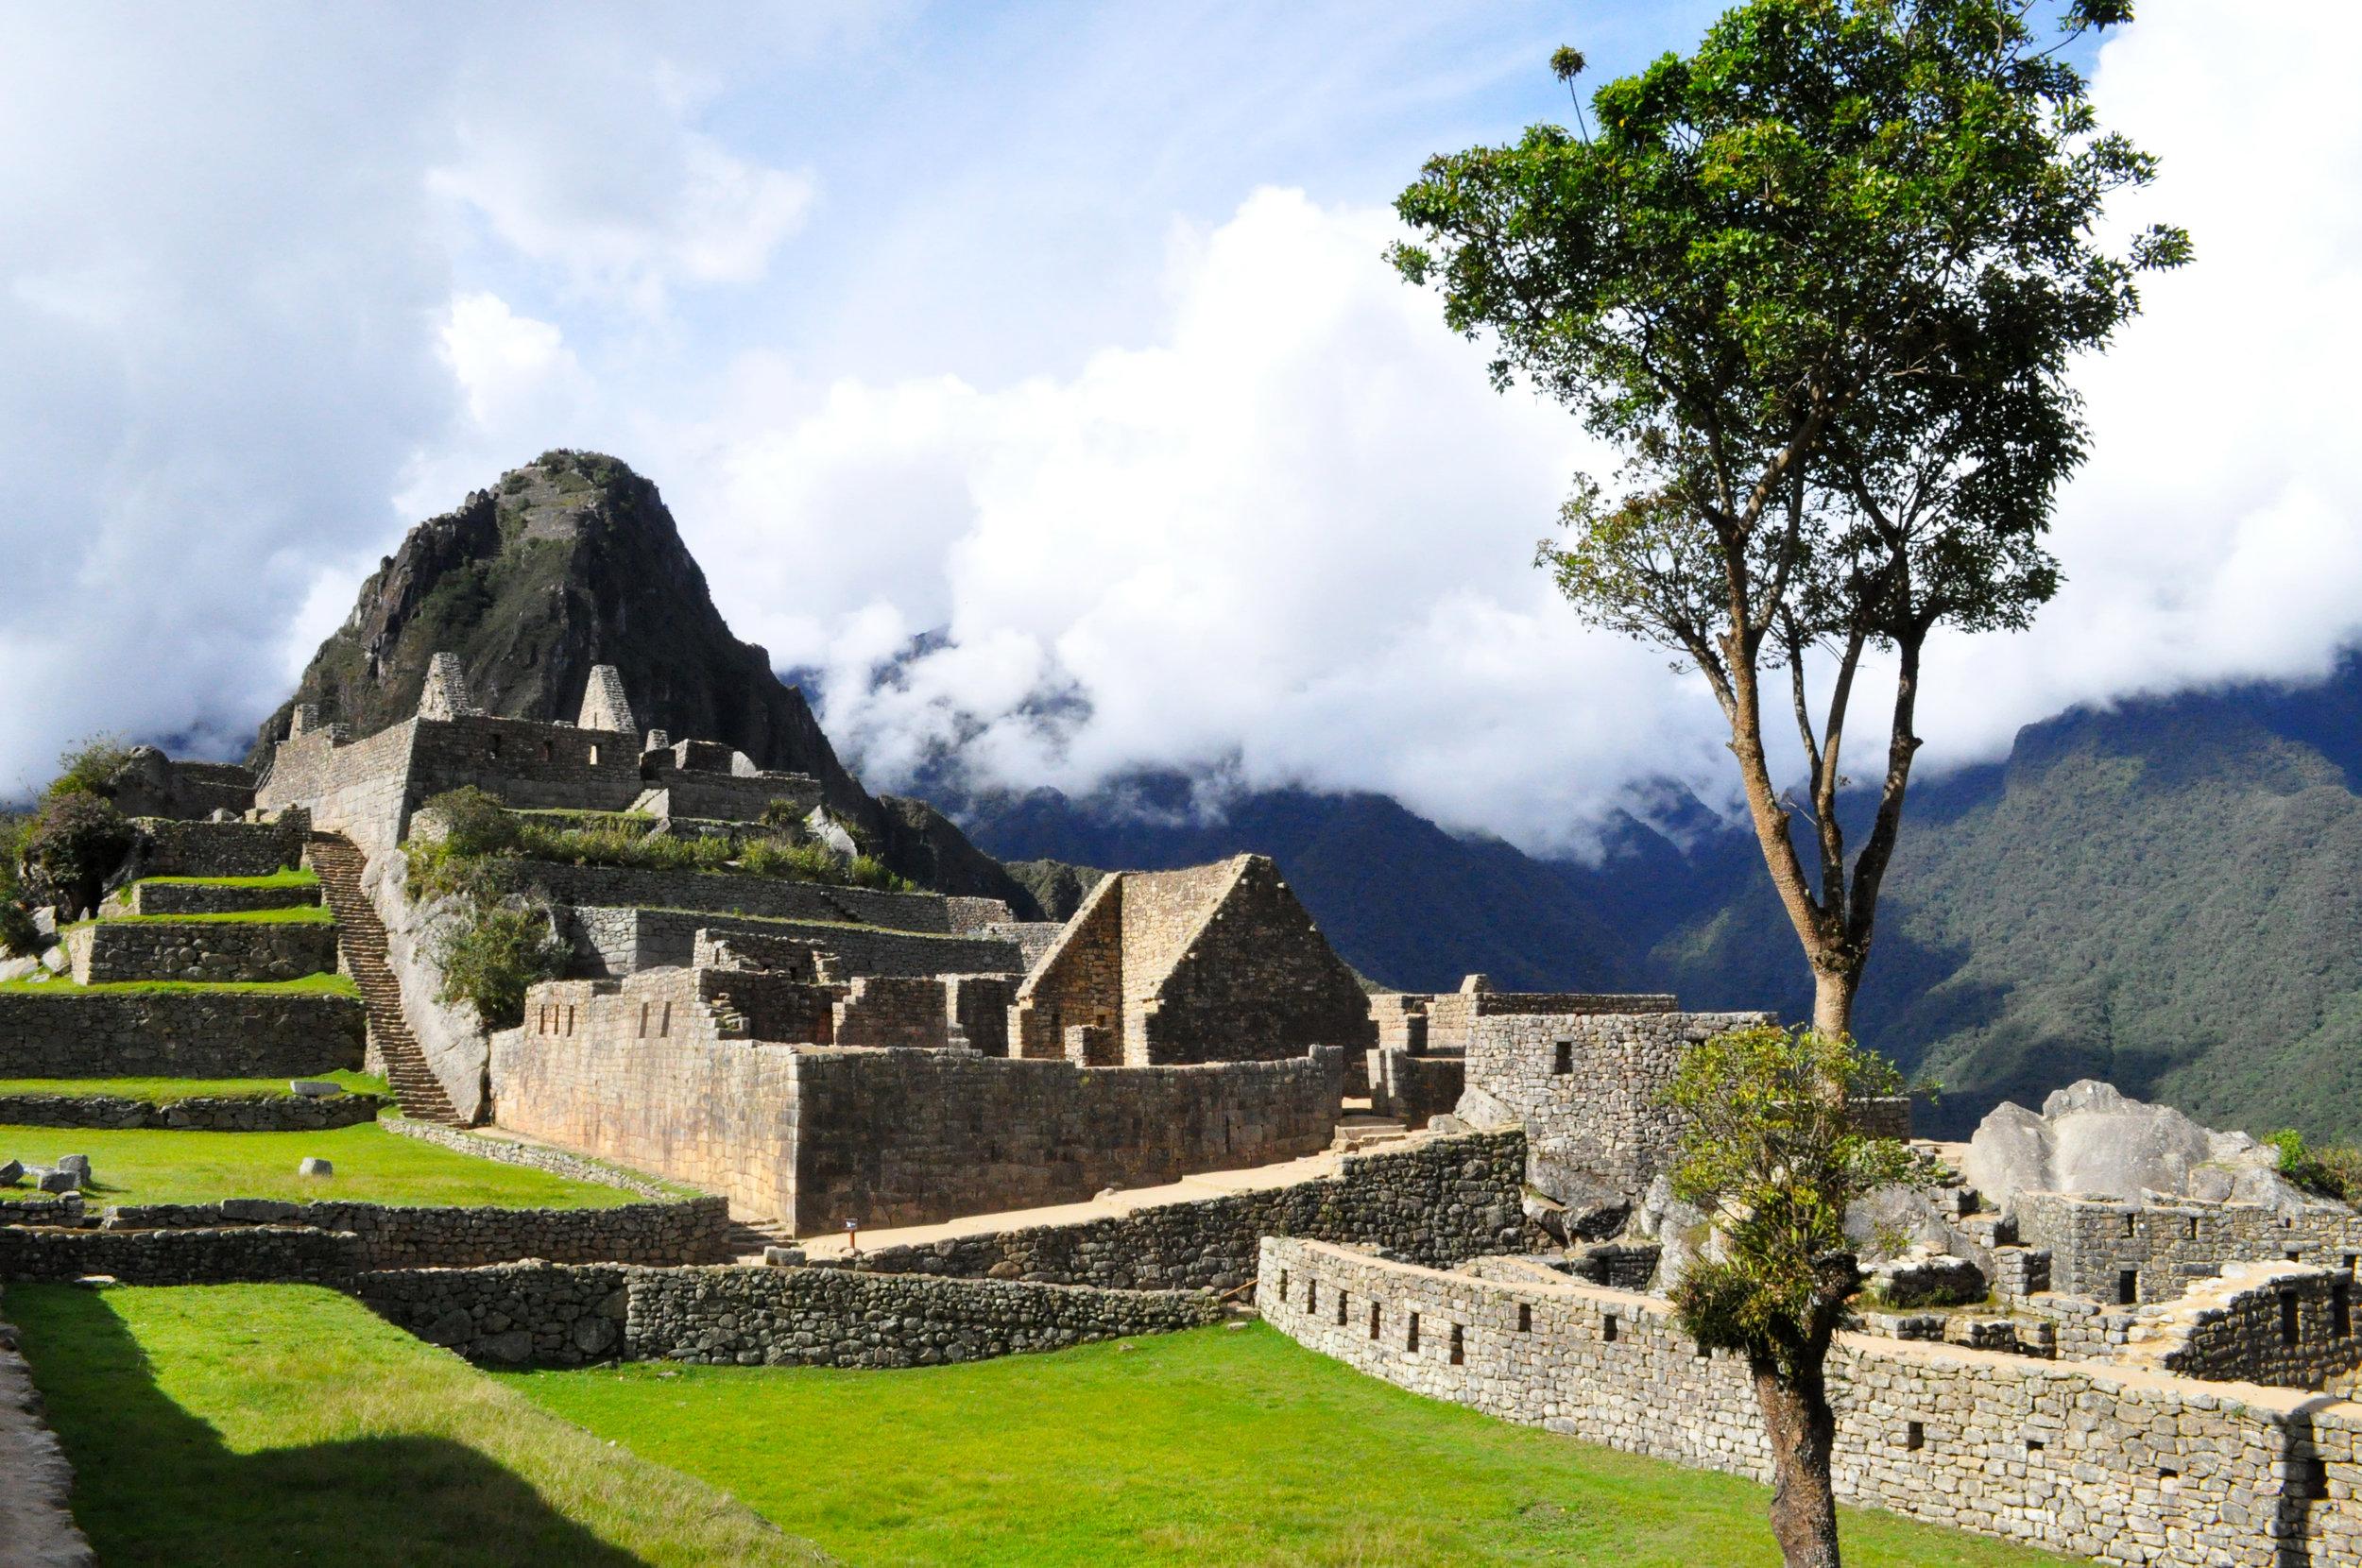 A sister tree grows in Machu Picchu